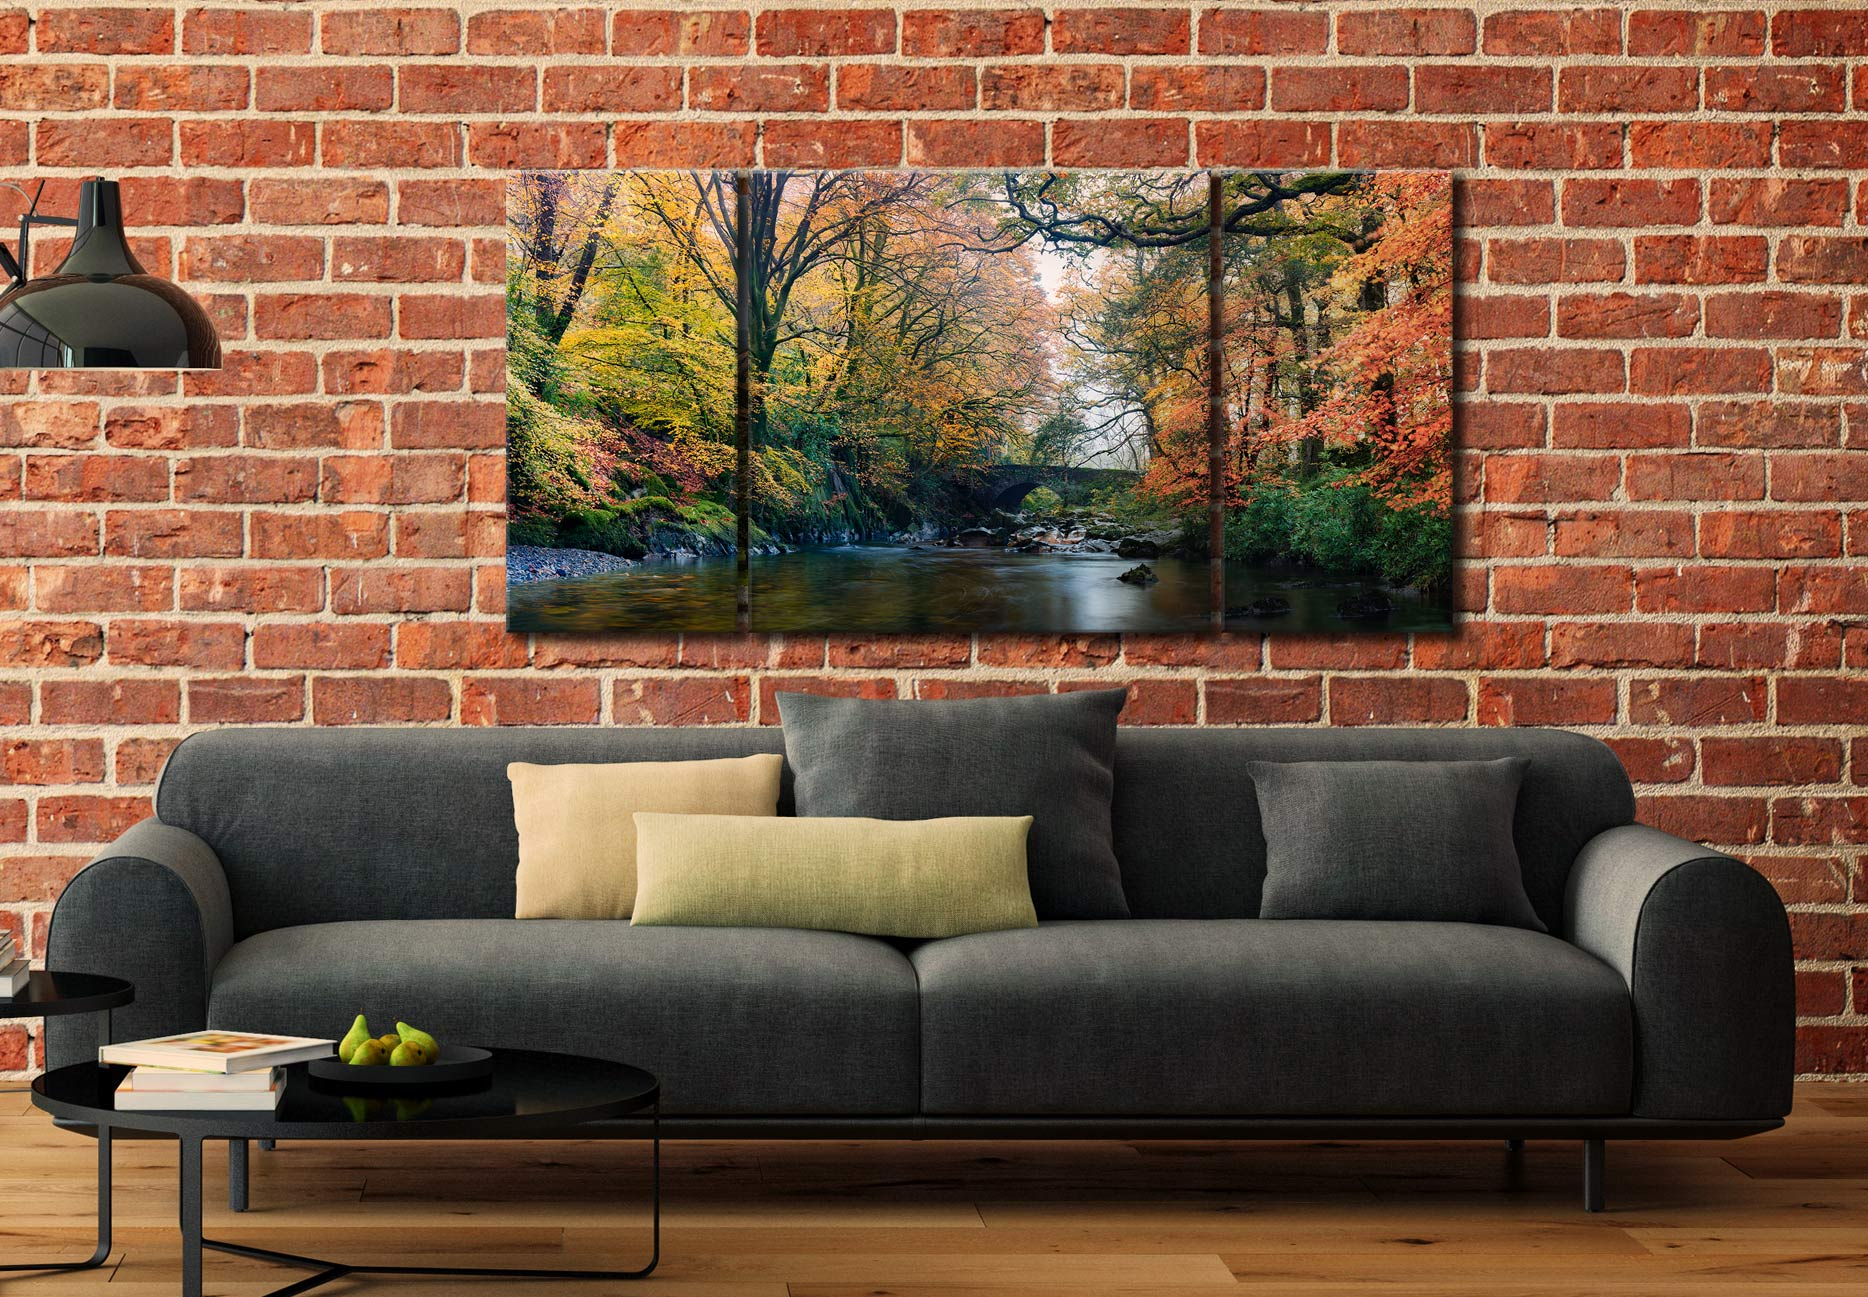 River Esk Bridge in Autumn - 3 Panel Wide Centre Canvas on Wall